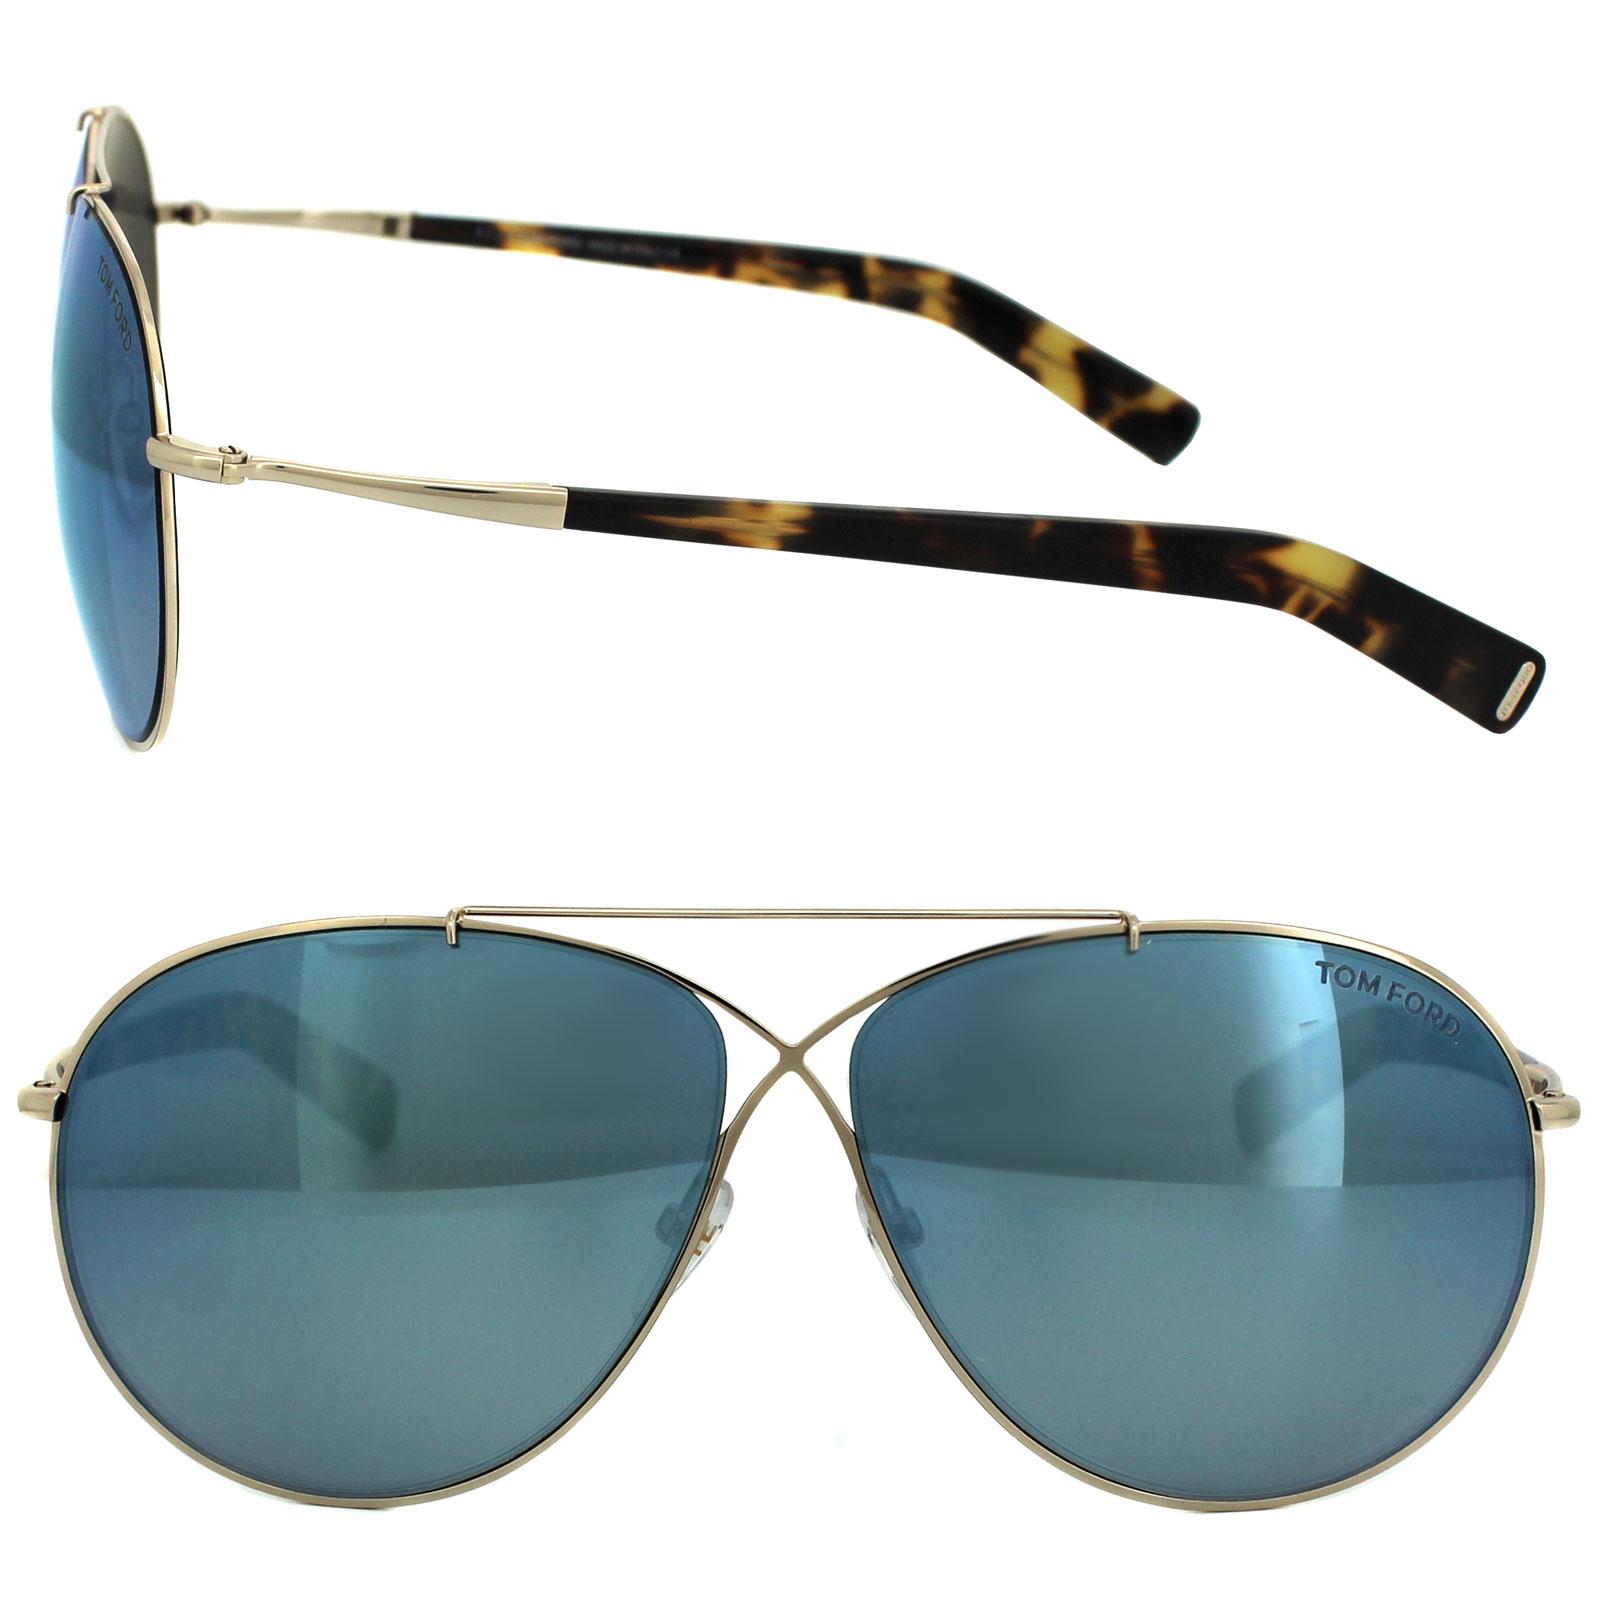 Cheap Tom Ford 0374 Eva Sunglasses Discounted Sunglasses